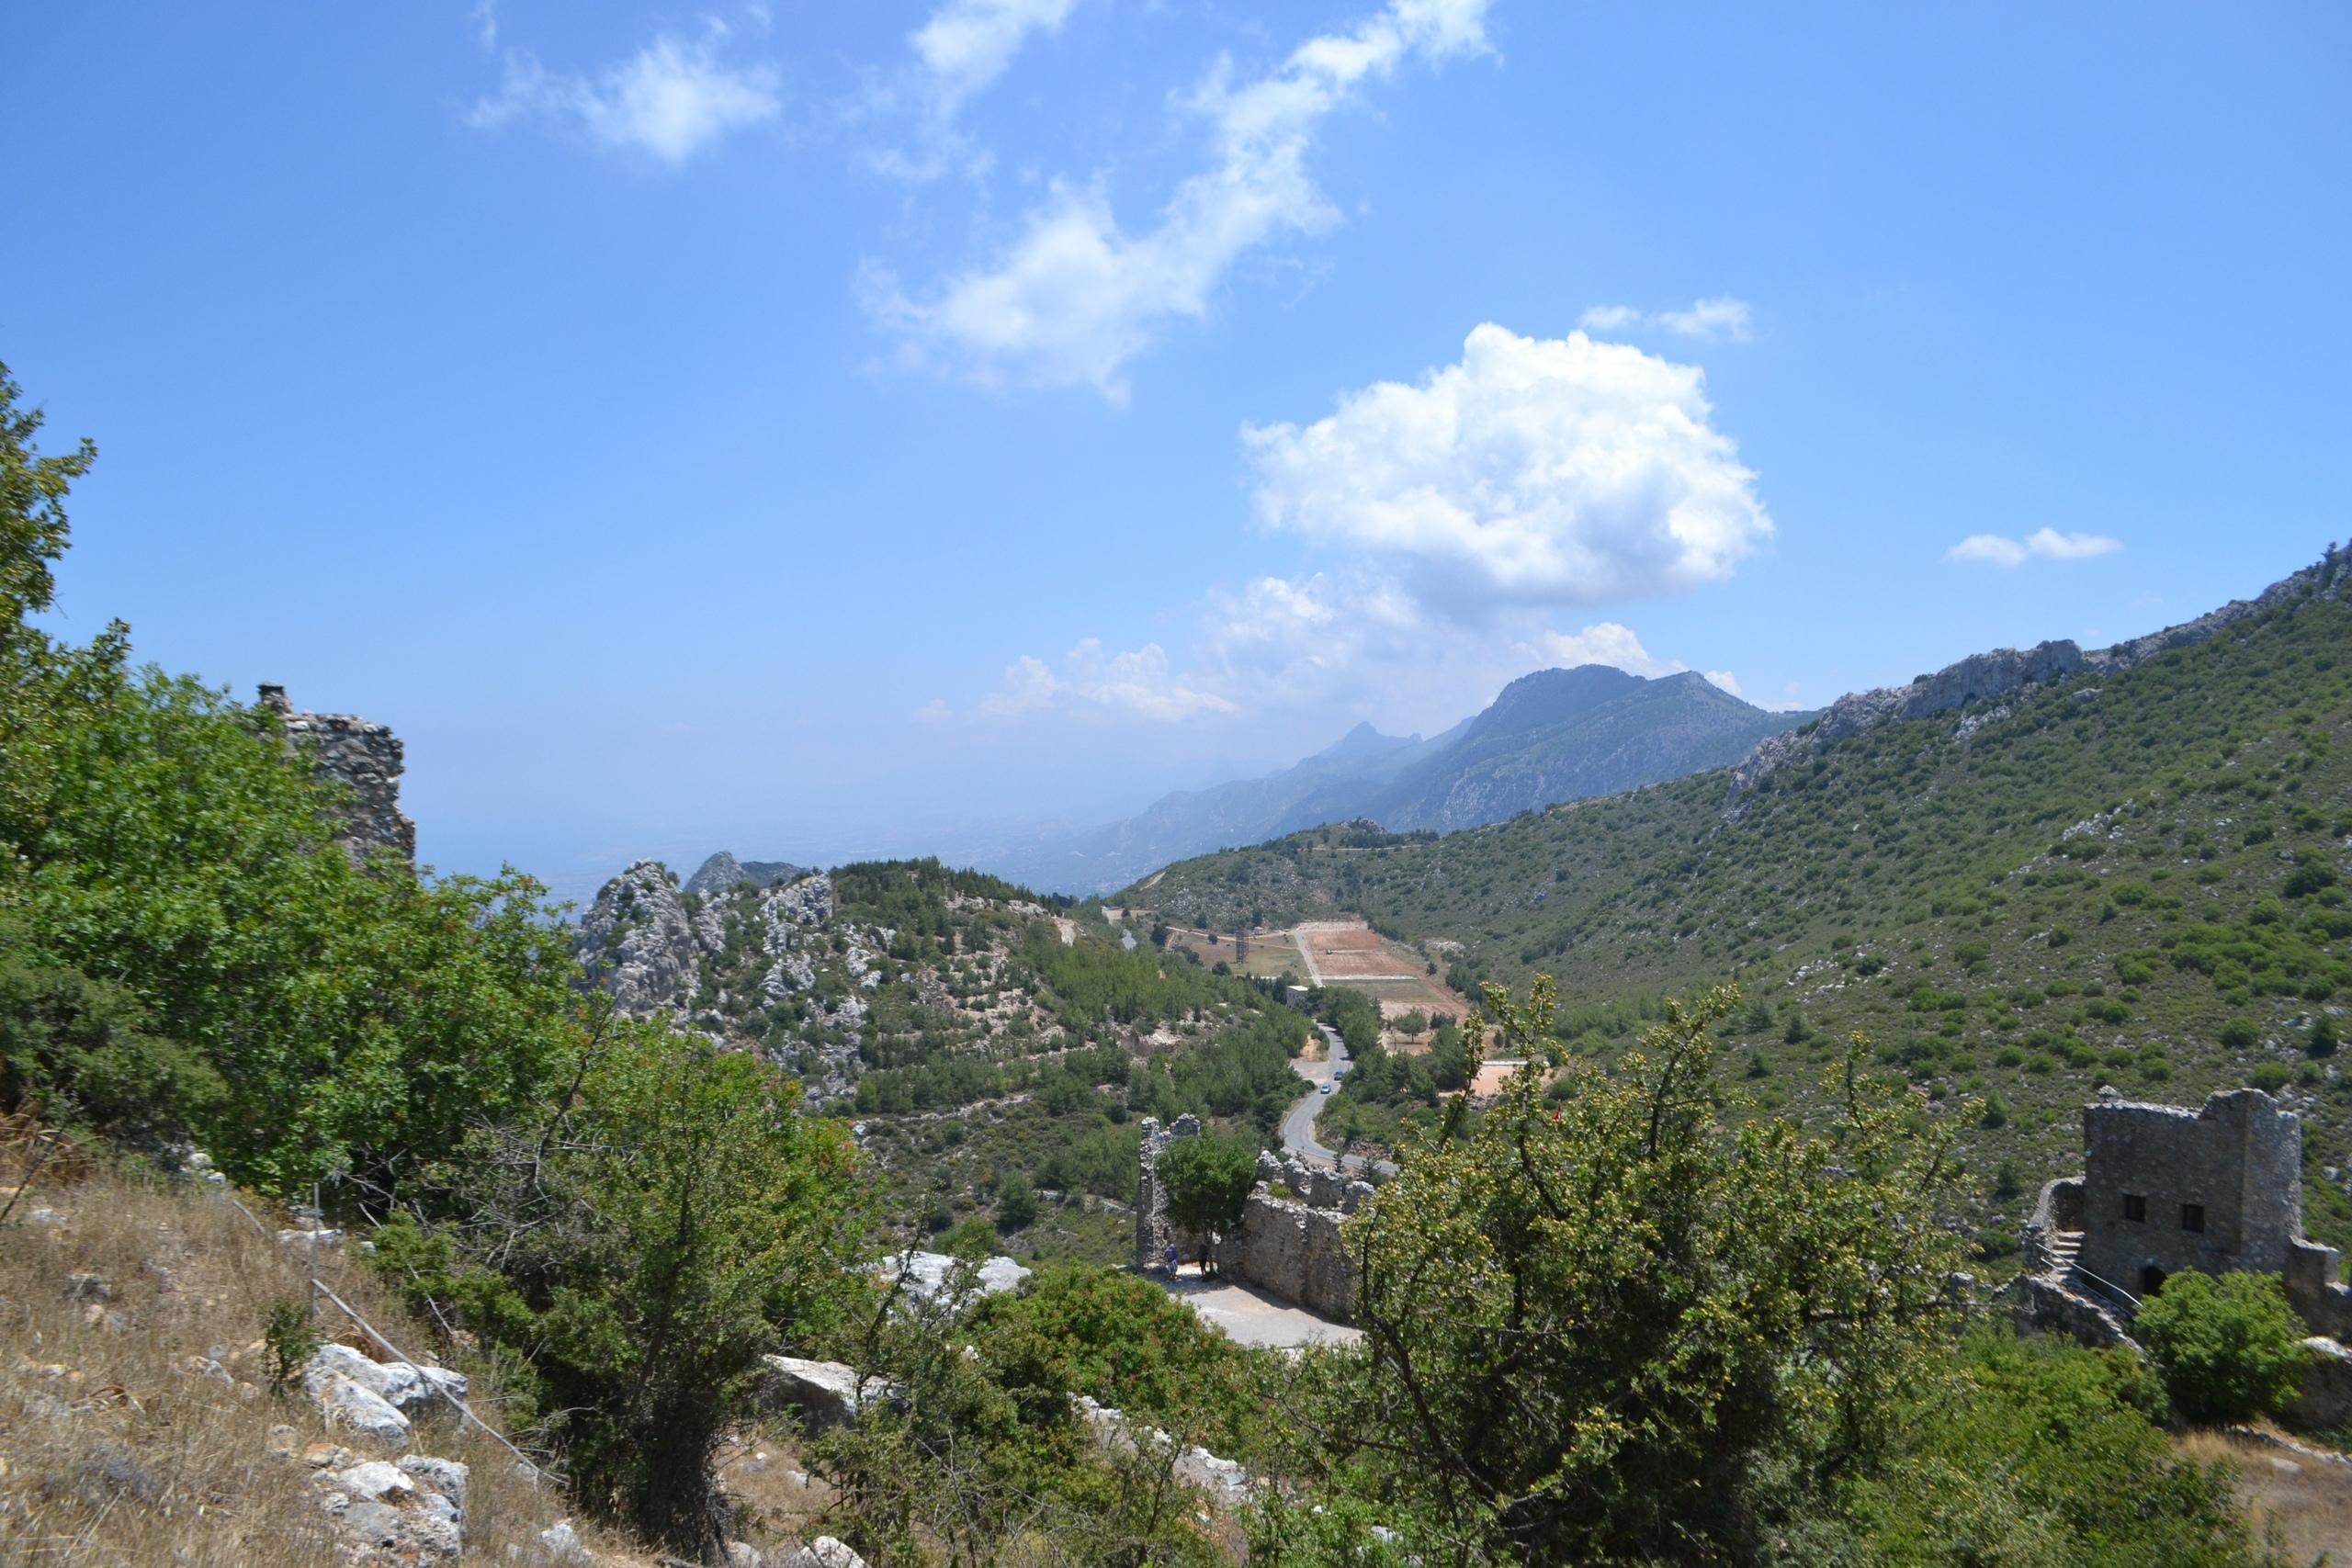 Северный Кипр. Замок Святого Иллариона. (фото). KAe2qNu24Xw